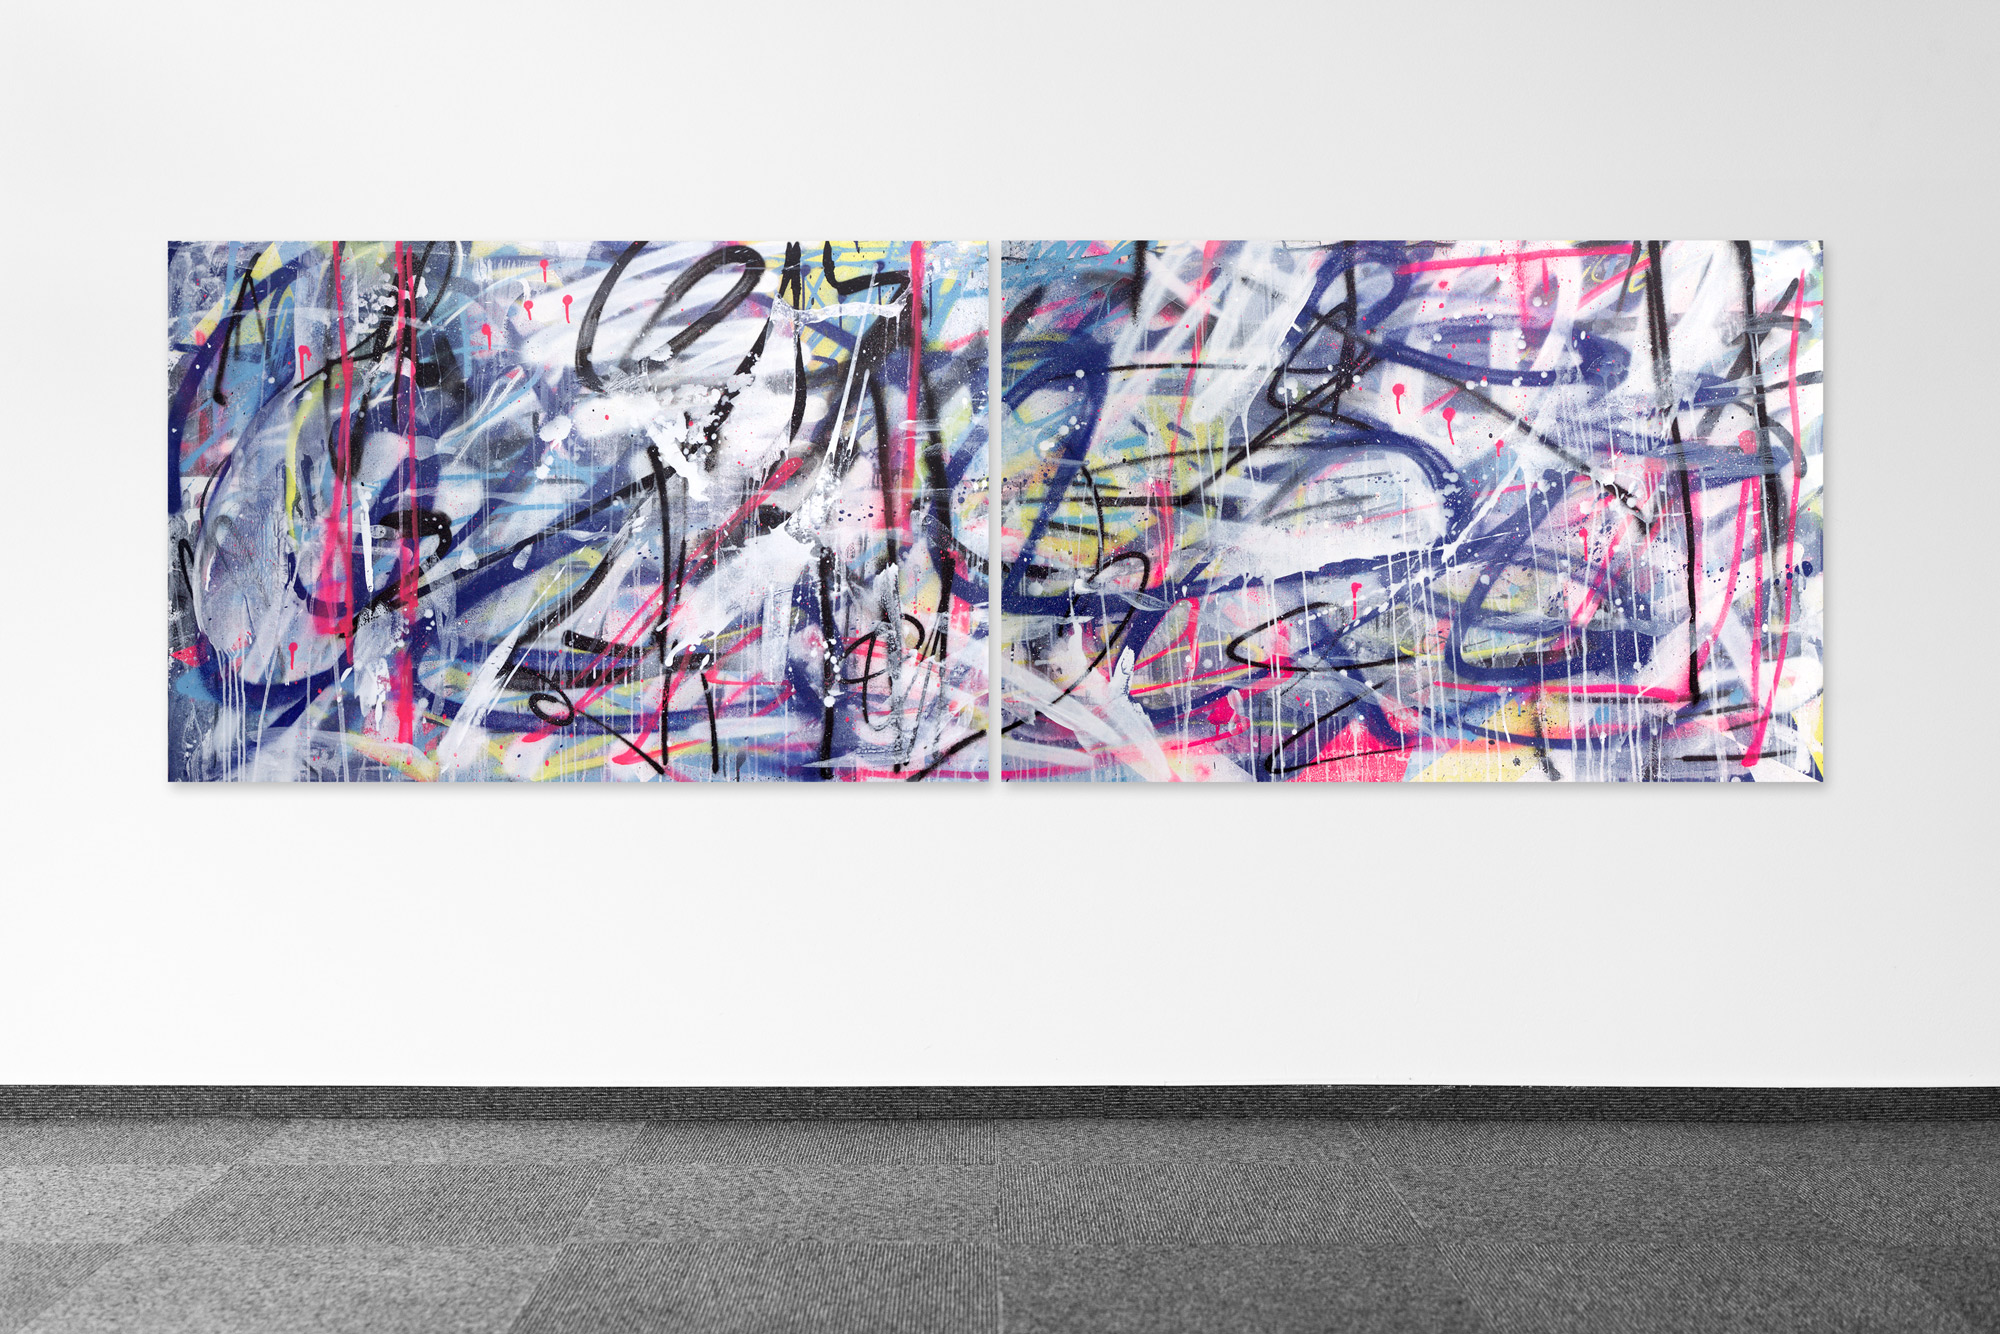 graffiti-diptych-2018-brad-waters-art